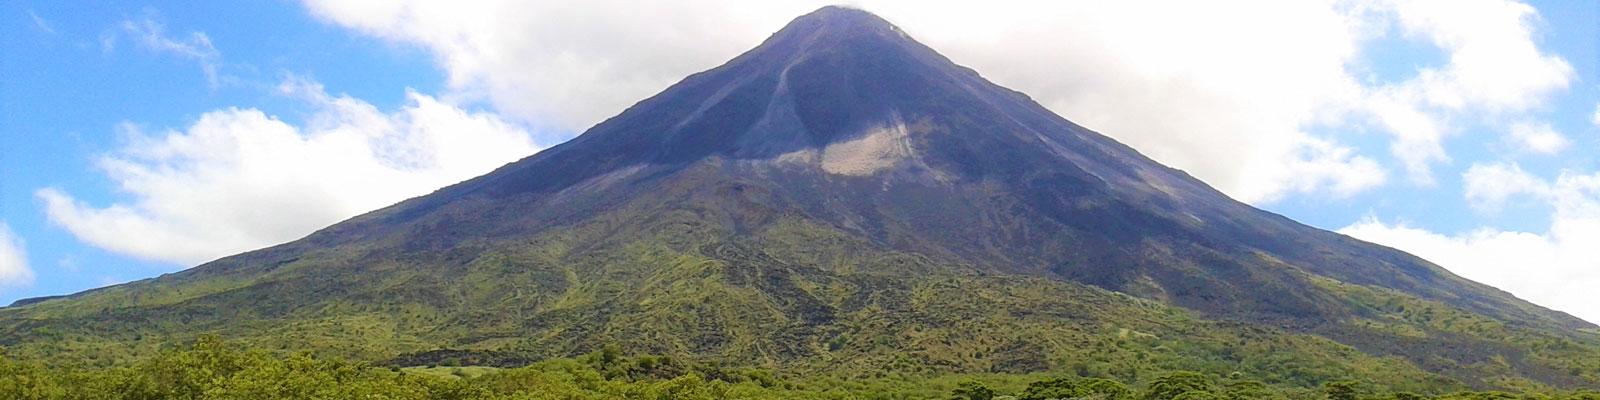 Costa Rica Vegan Travel Guide